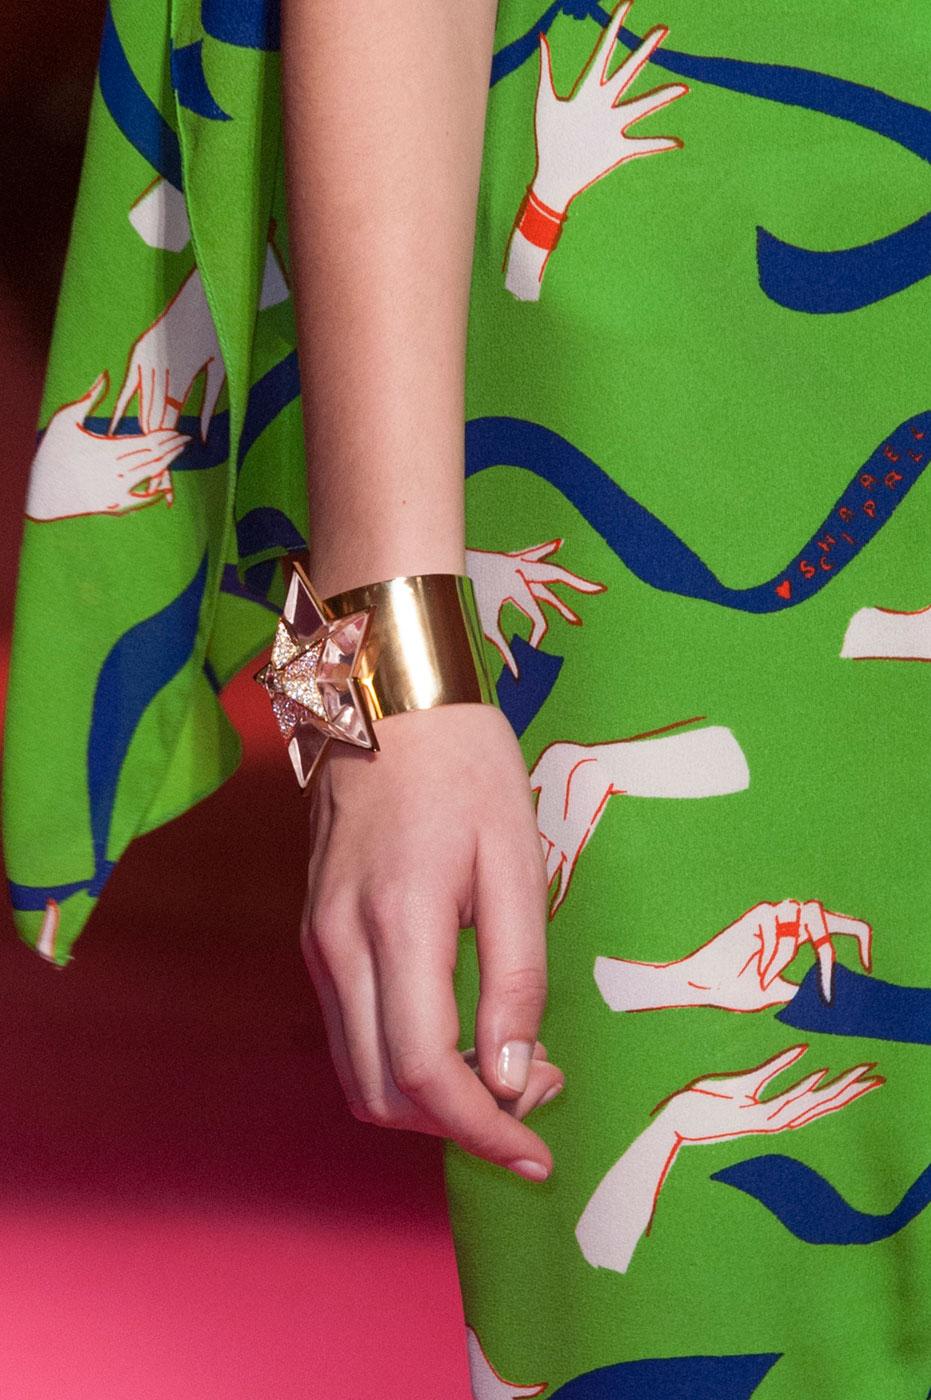 Schiaparelli-fashion-runway-show-close-ups-haute-couture-paris-spring-summer-2015-the-impression-30